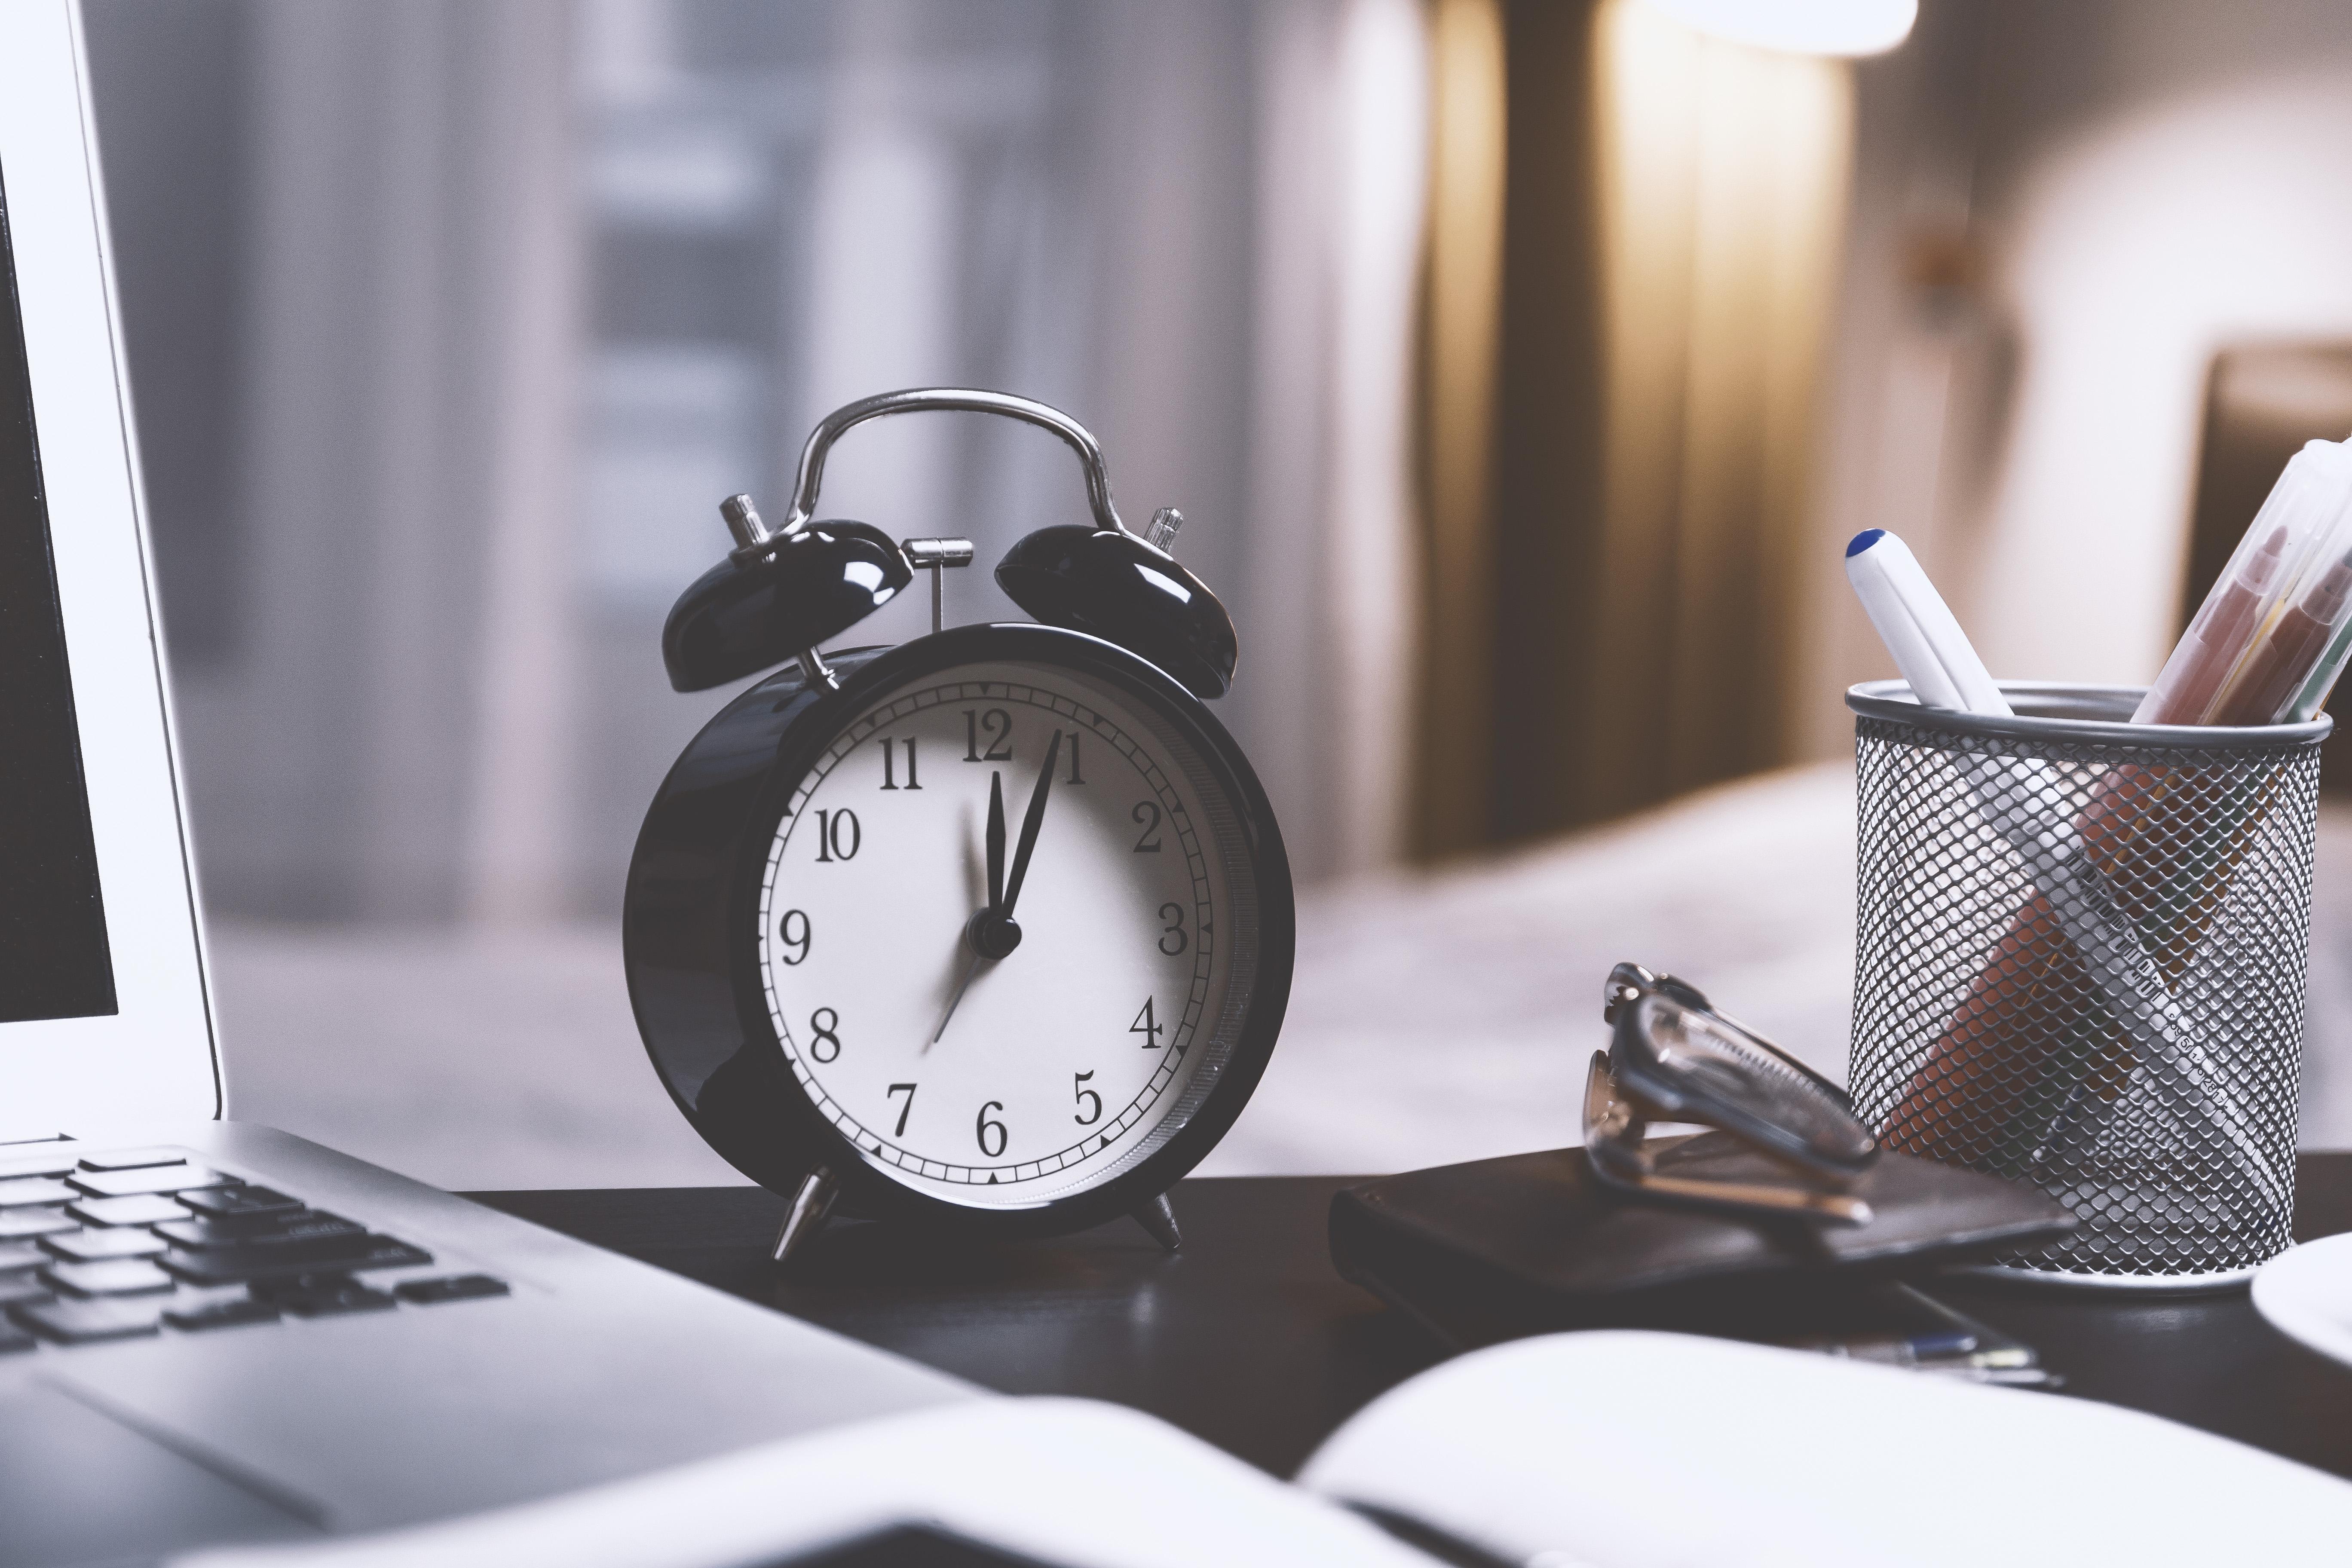 Black Twin Bell Alarm Desk Clock on Table - Hotcopy